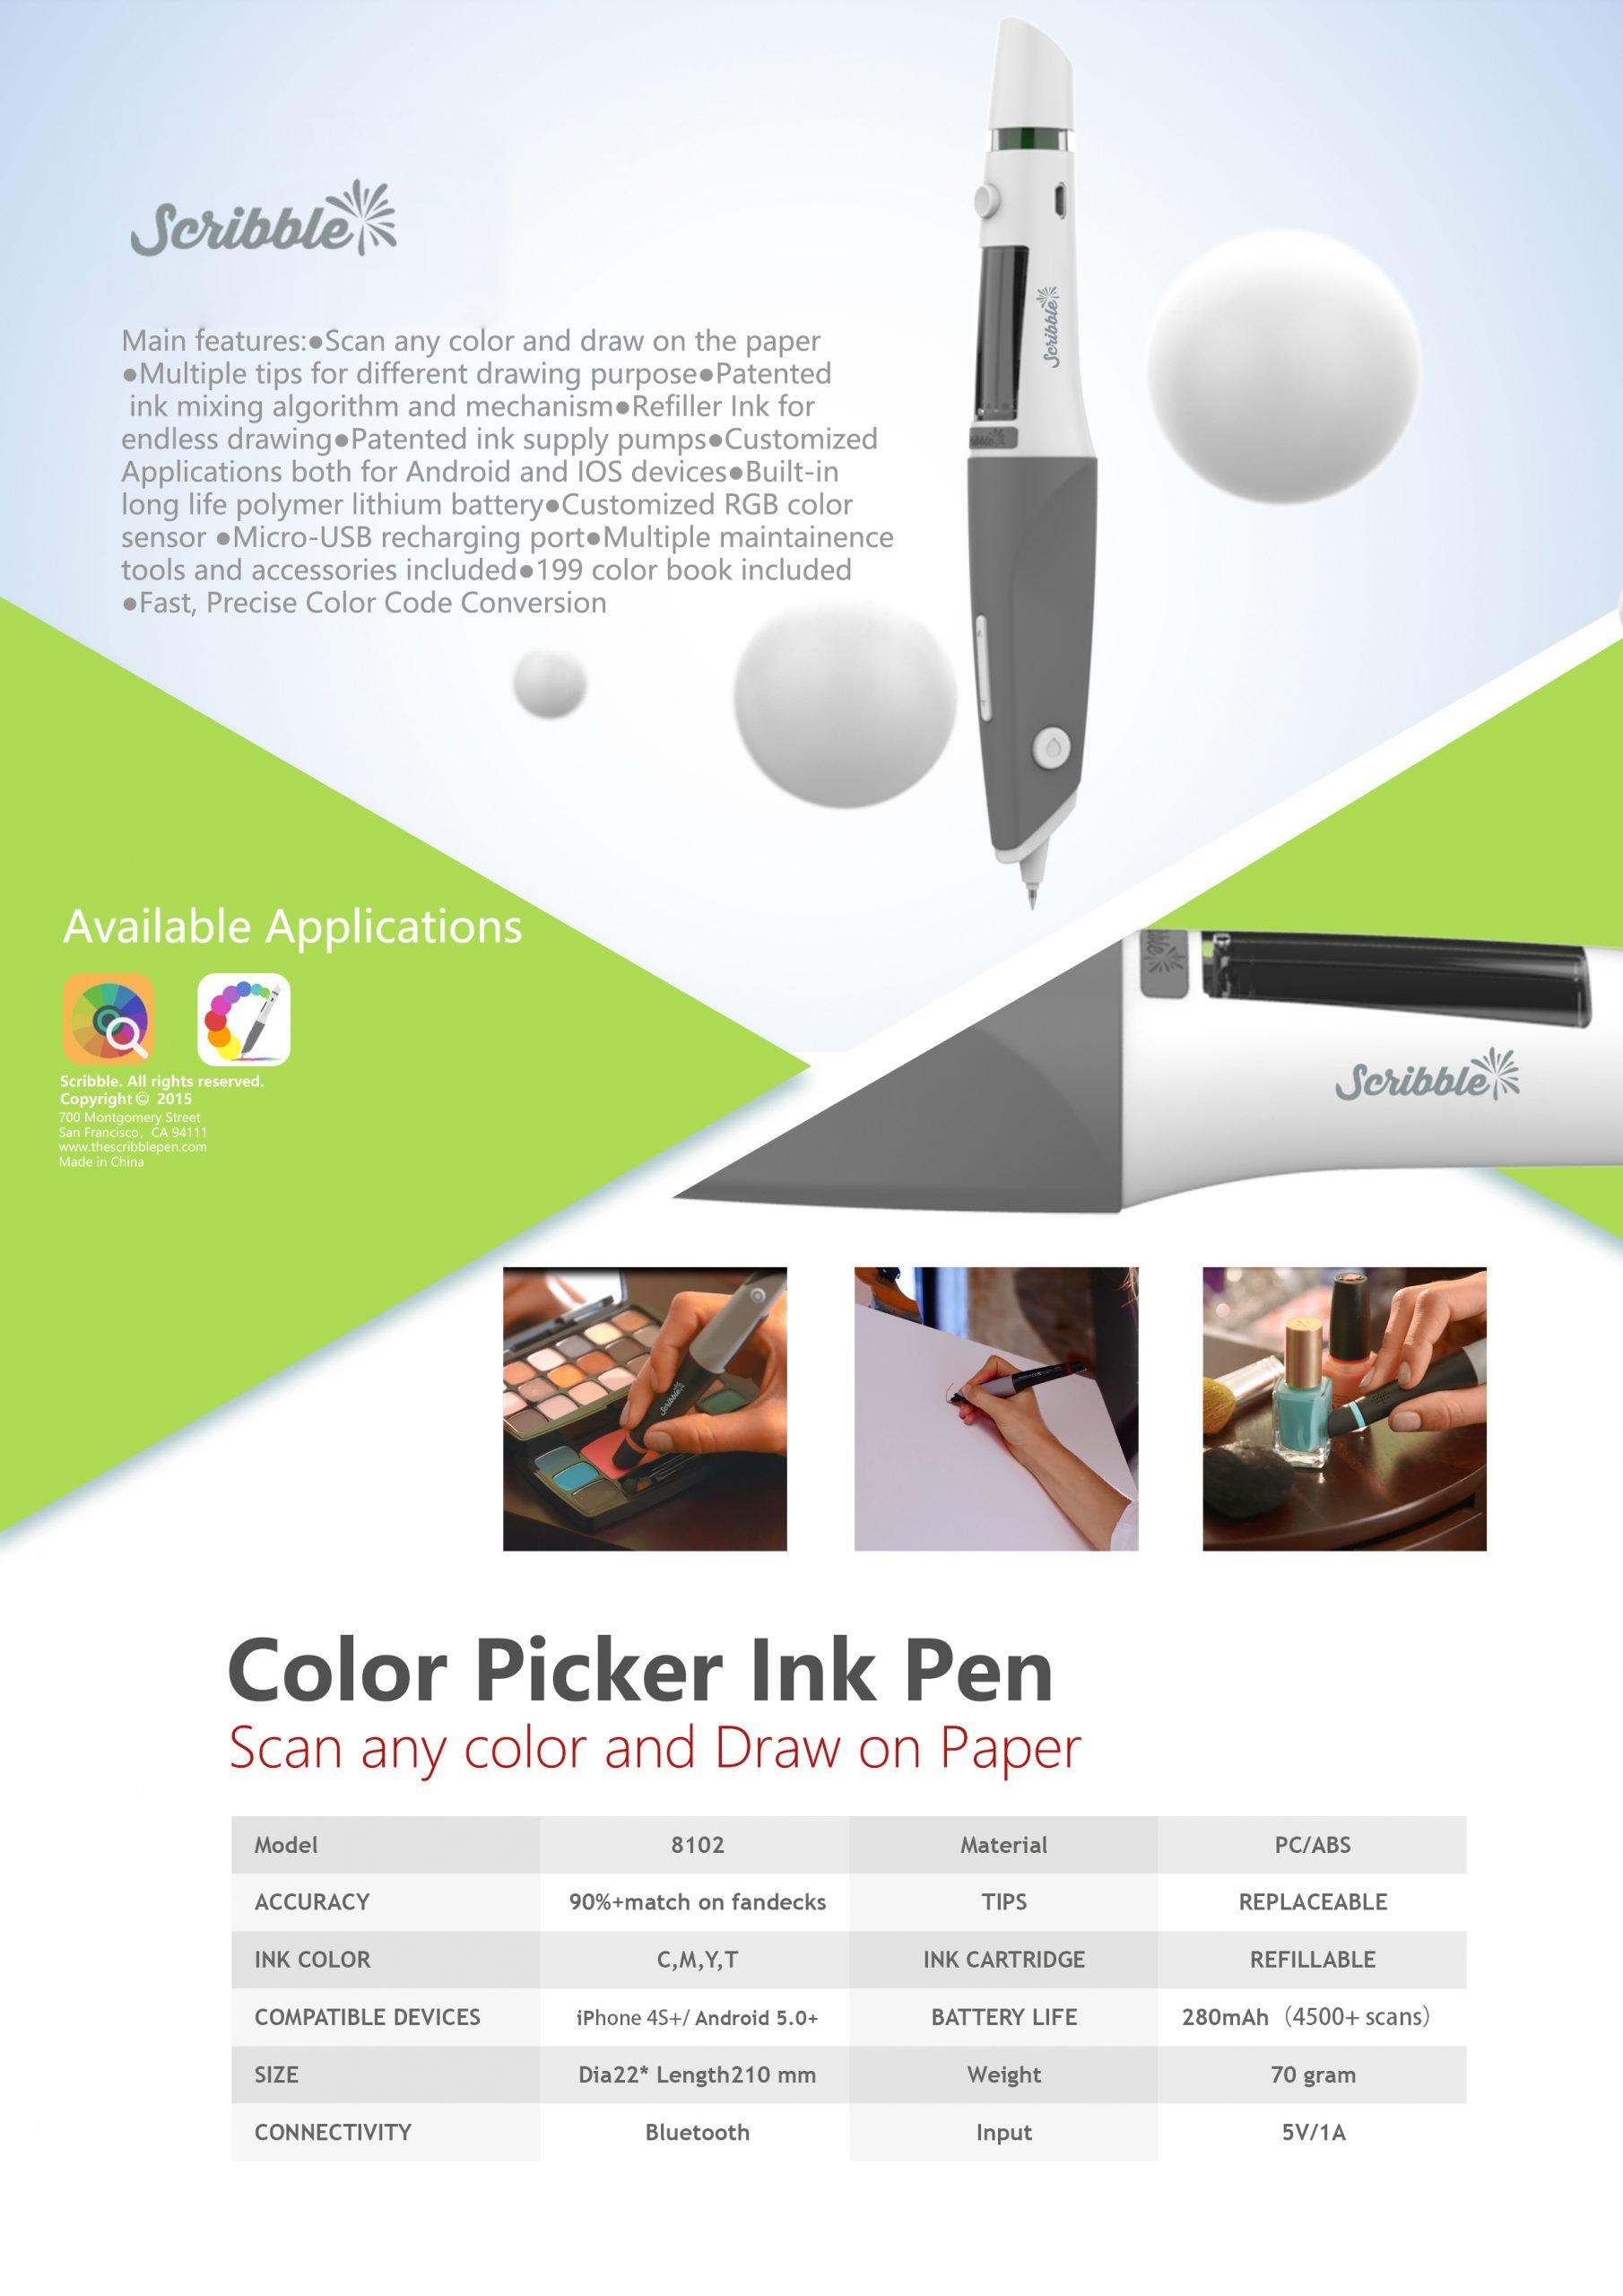 Color Picker Ink Pen